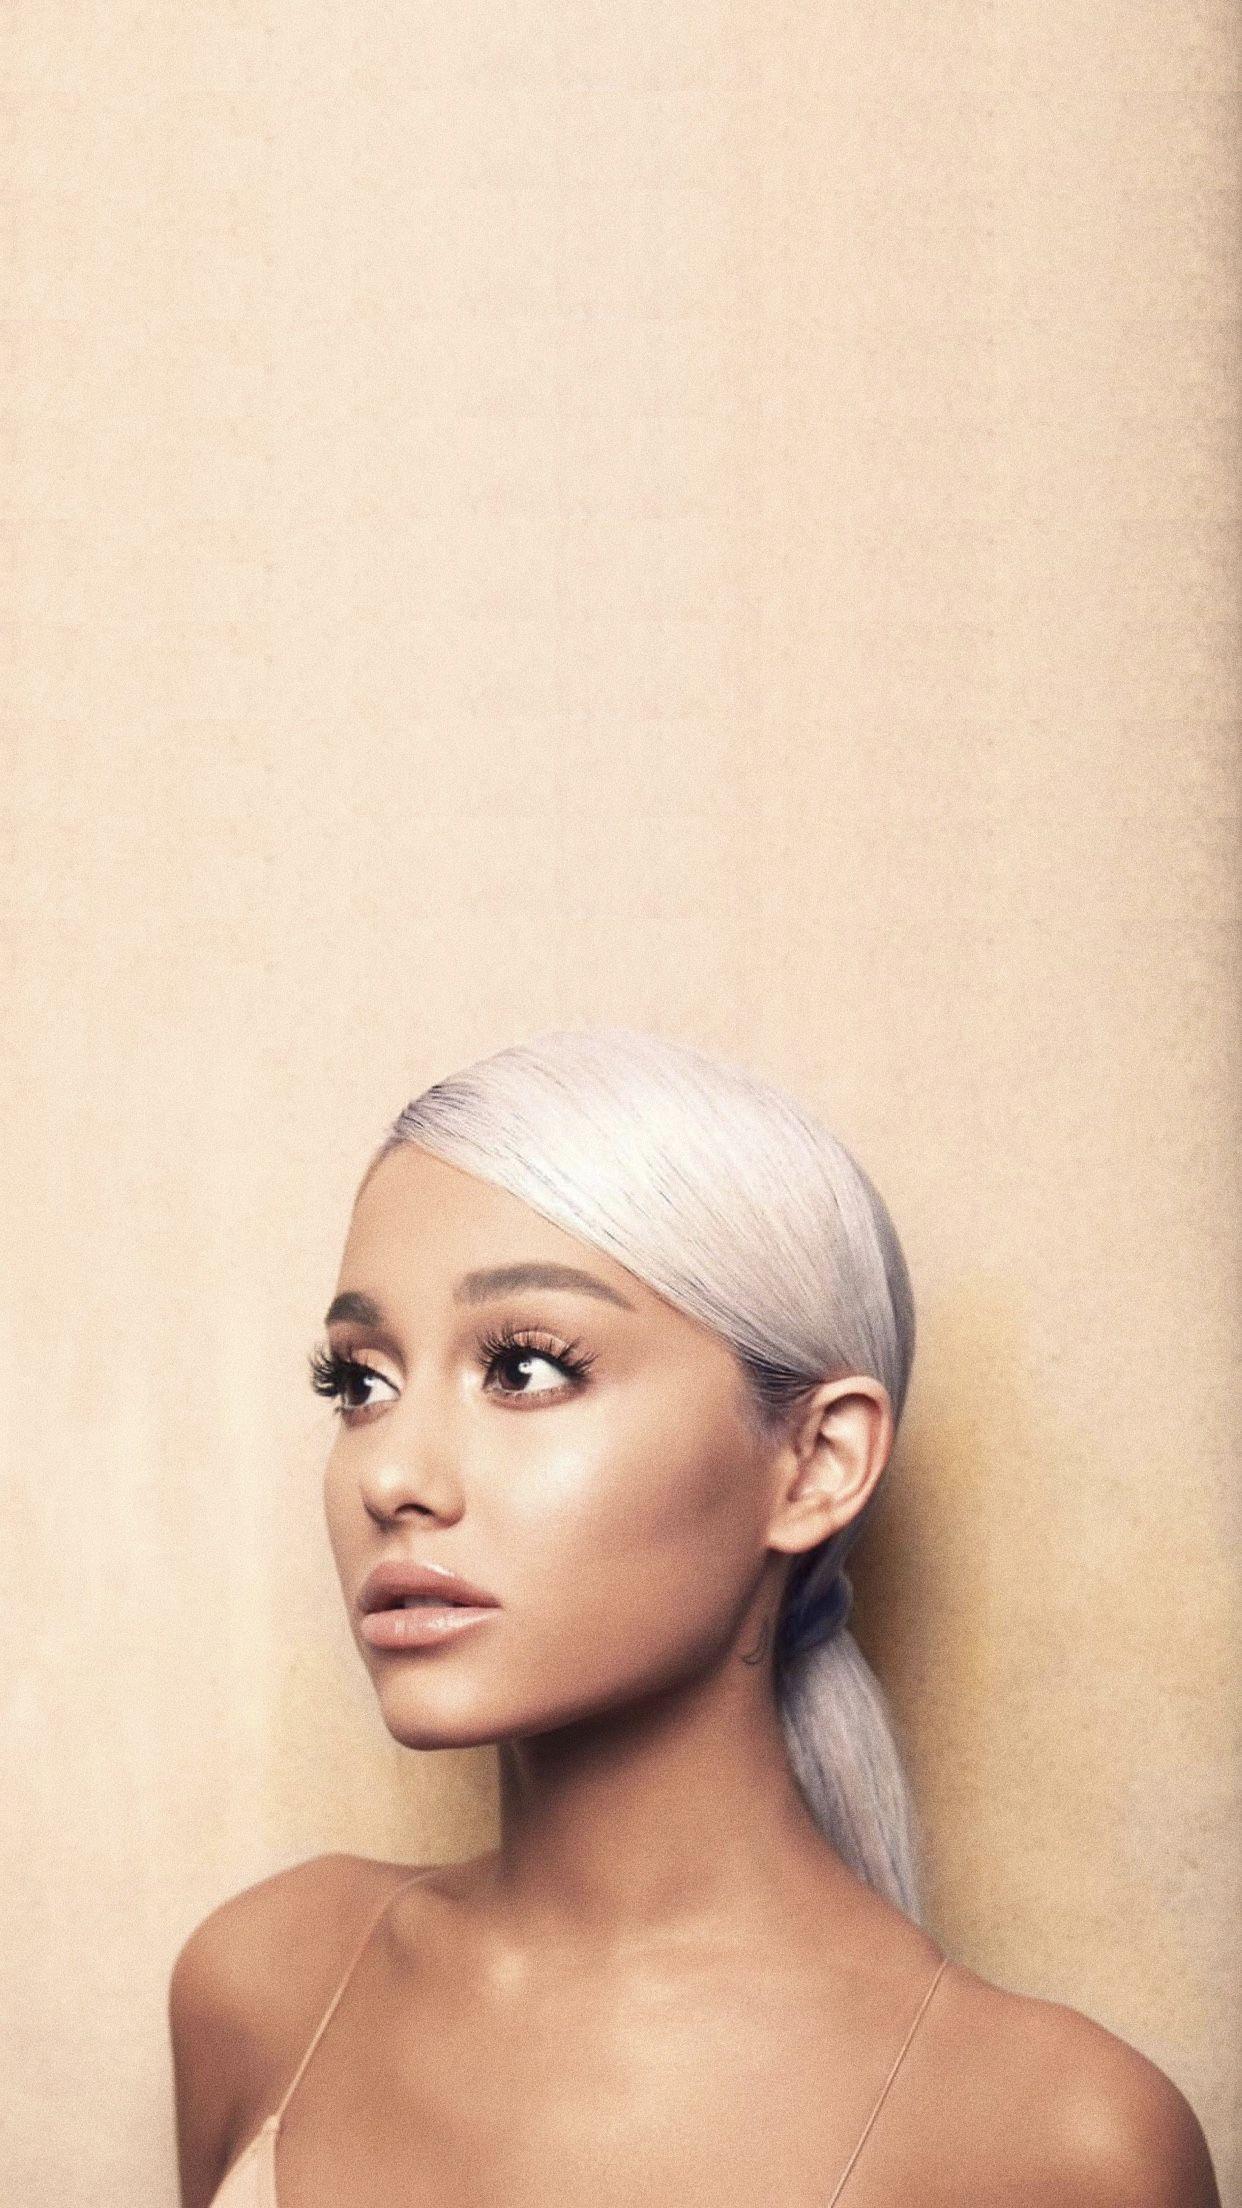 Ariana Grande Sweetener Wallpapers Top Free Ariana Grande Sweetener Backgrounds Wallpaperaccess